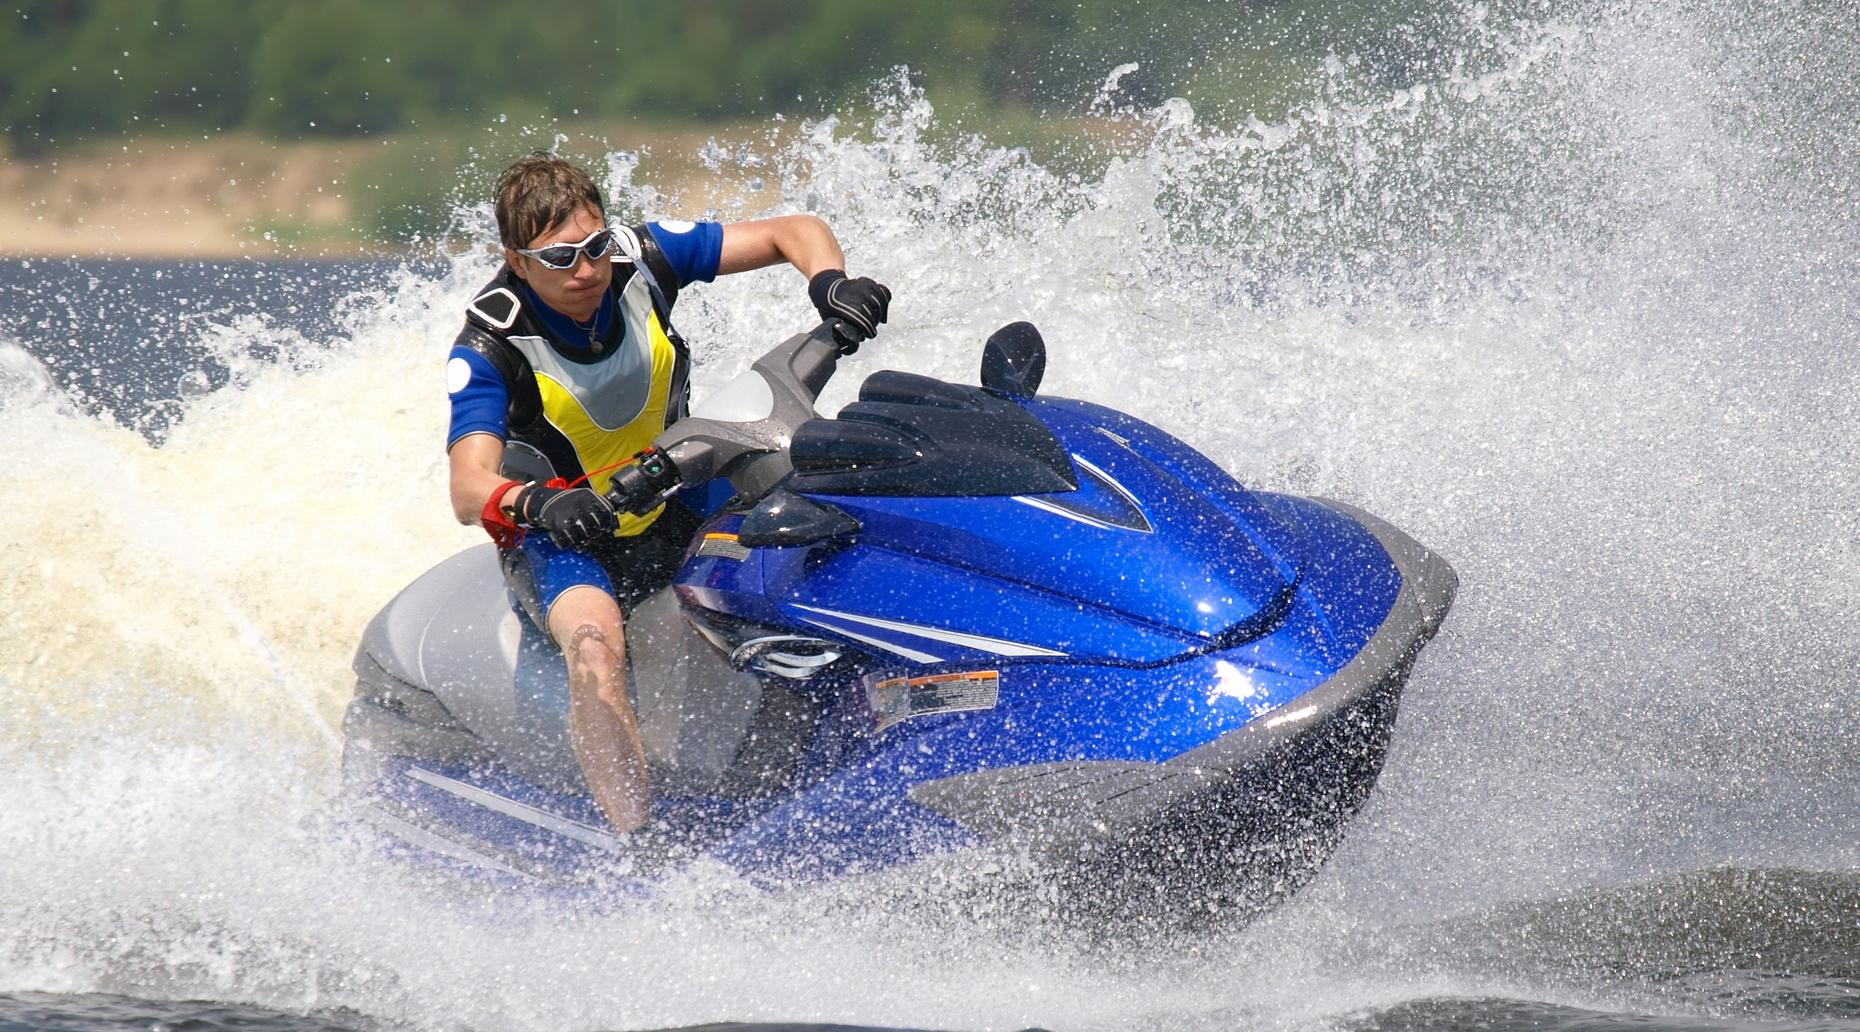 Three-Seat Two-Hour Jet Ski Rental in Lewisville